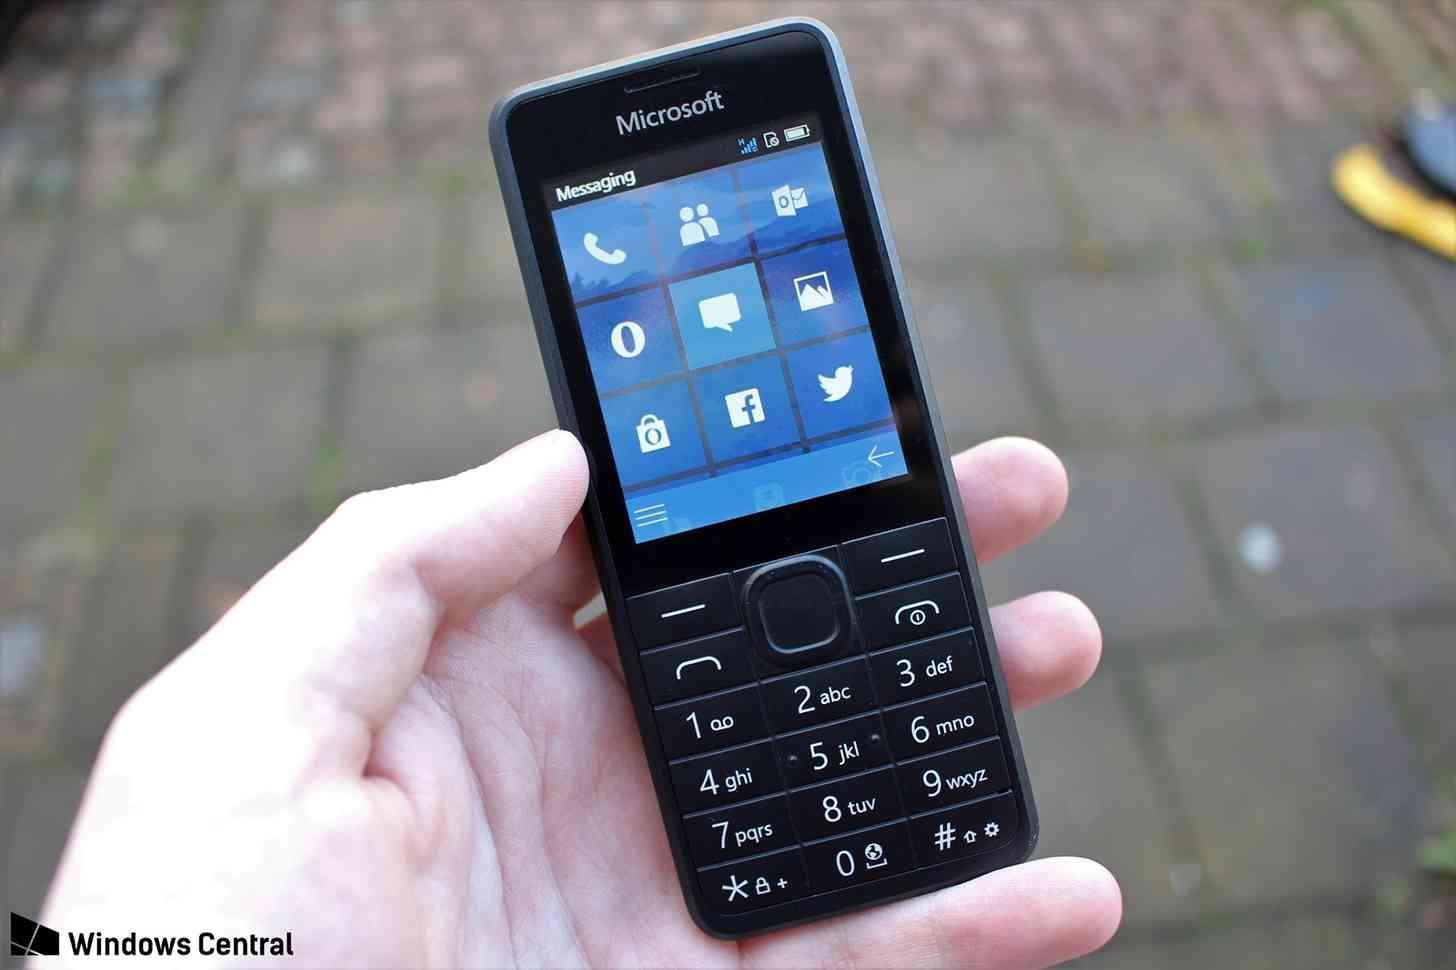 Microsoft RM-1182 feature phone prototype